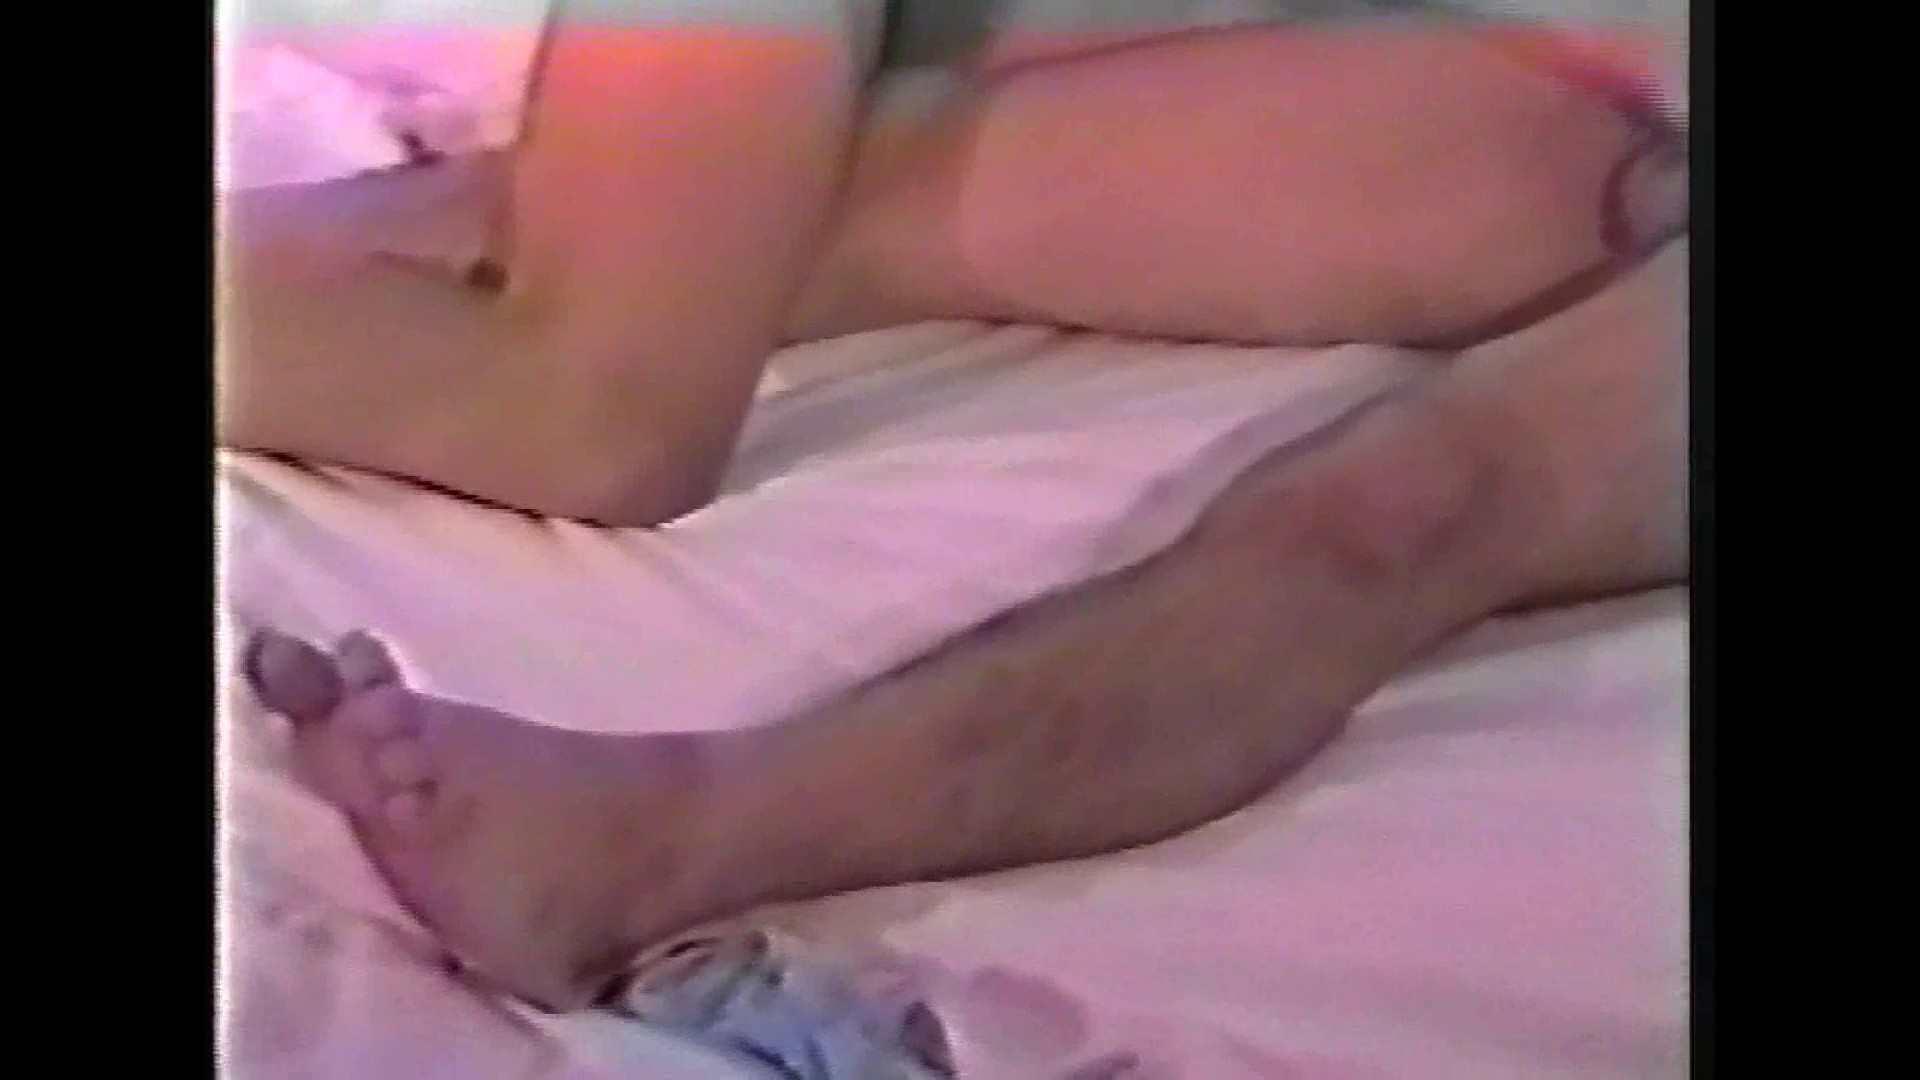 GAYBOY宏のオカズ倉庫Vol.9-2 ノンケ達のセックス   GAY  104画像 81